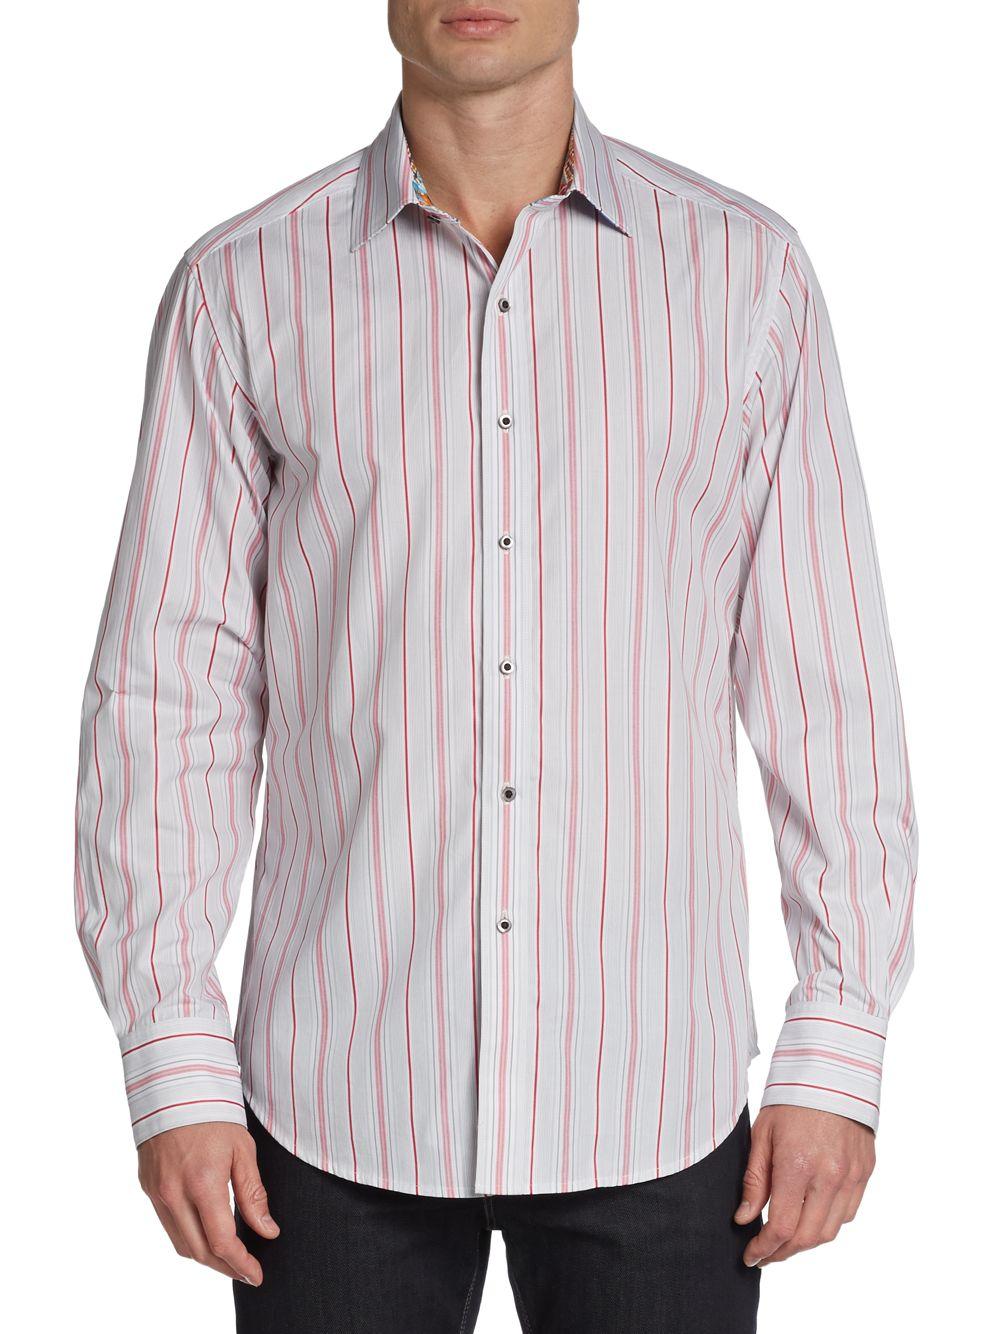 Robert graham classic fit striped cotton sport shirt in for Robert graham sport shirt